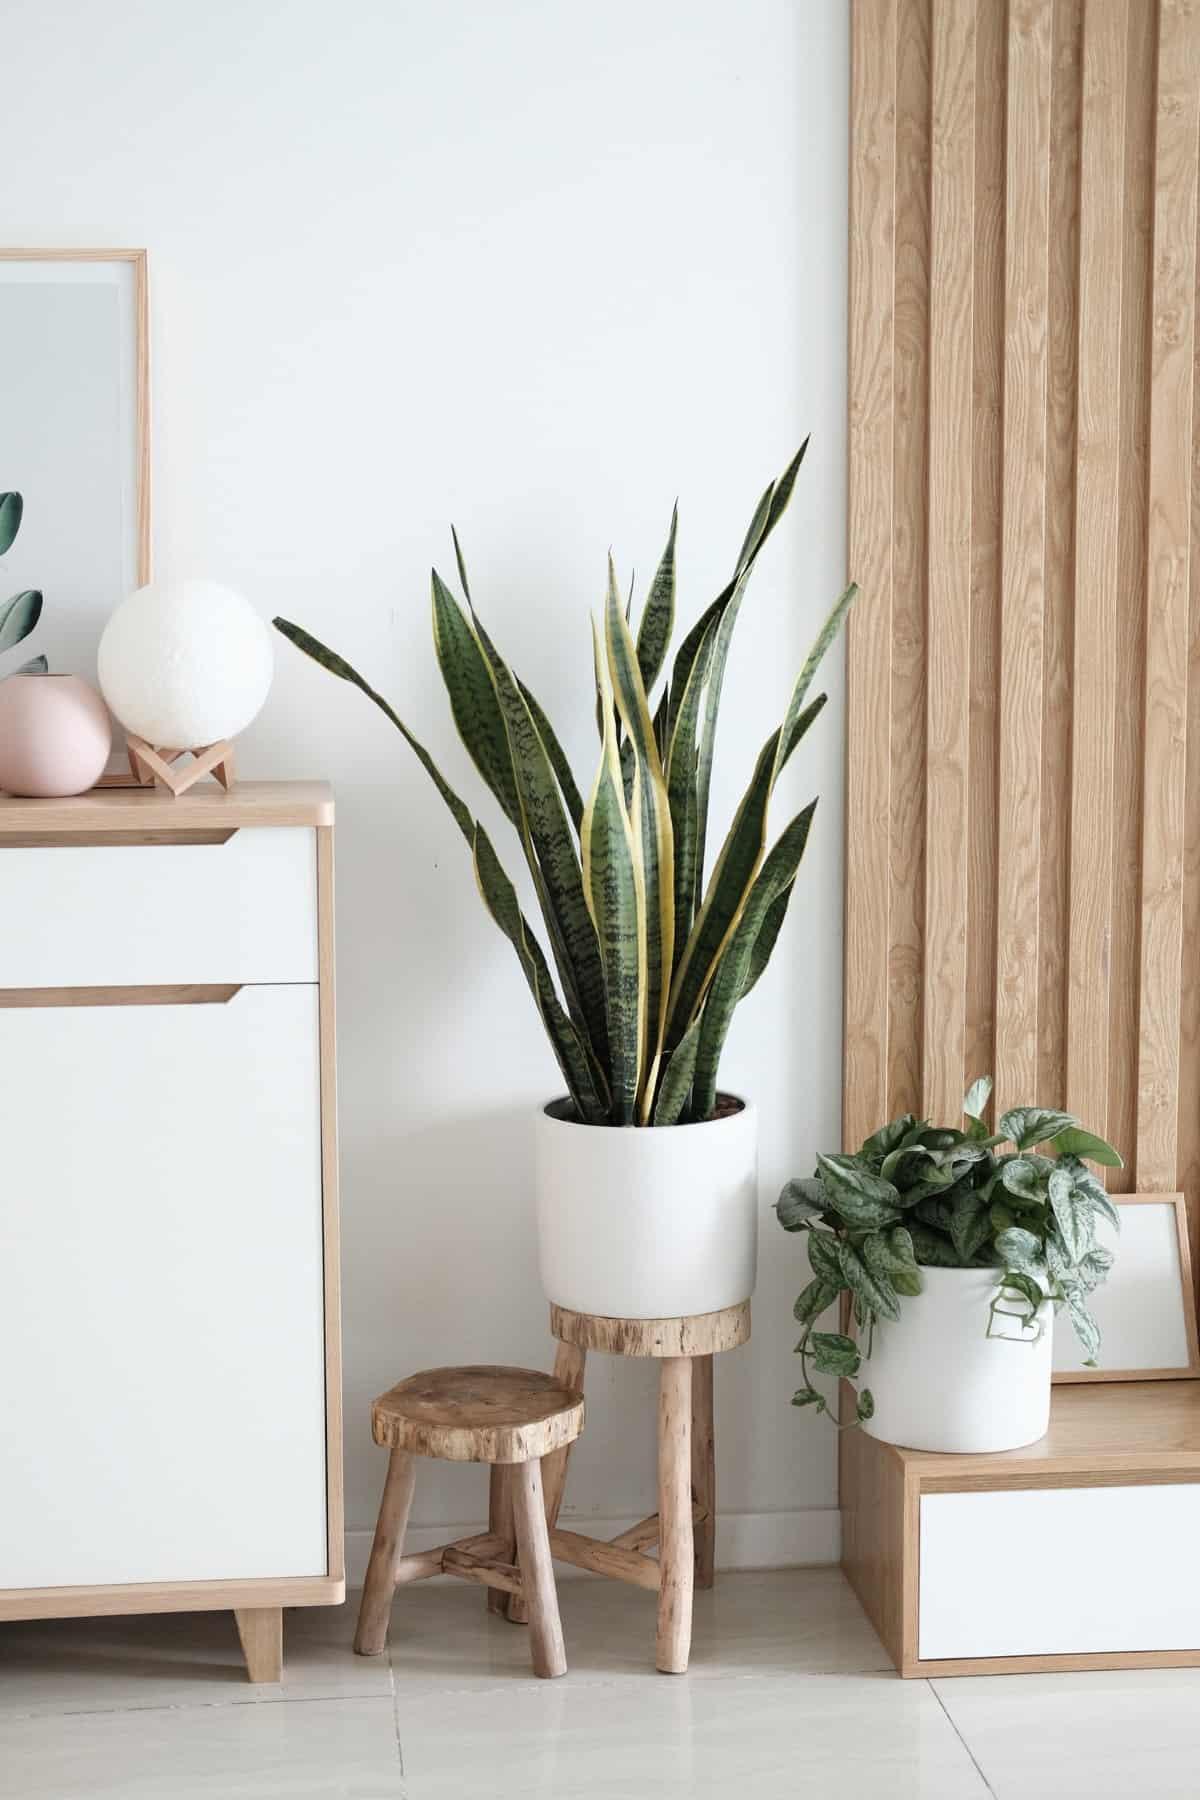 ev bitkisi sansivieria